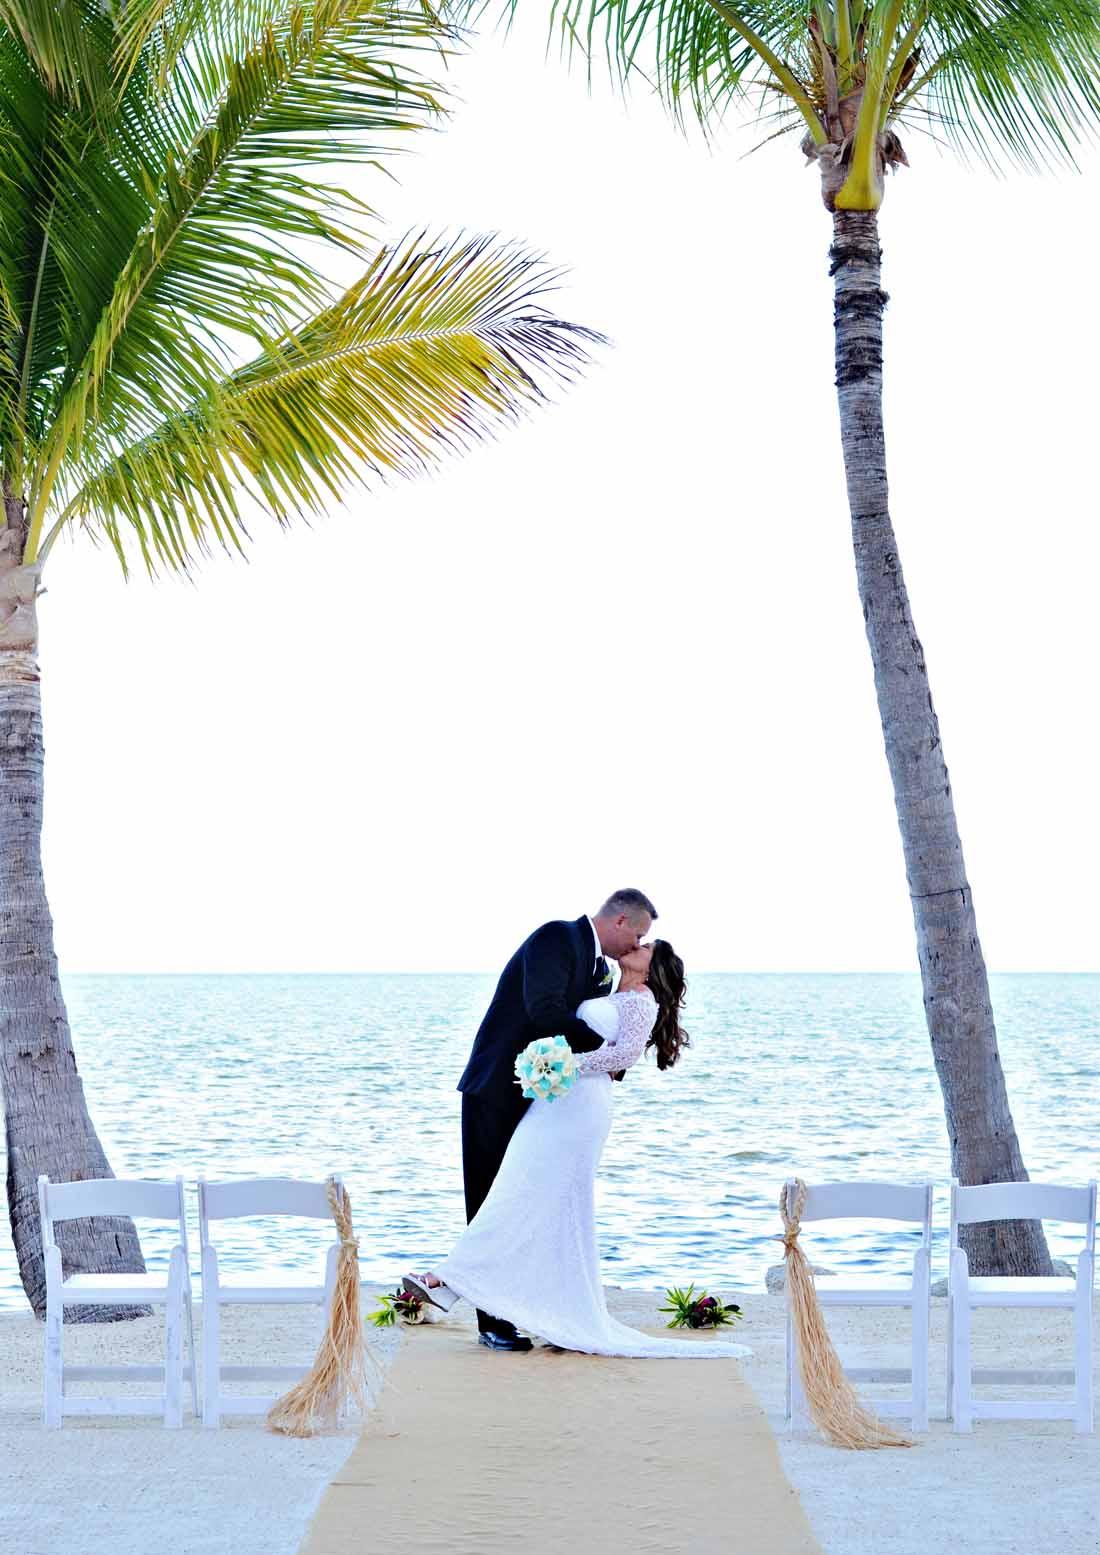 C 2016 MPV Intimate Weddings (20).jpg